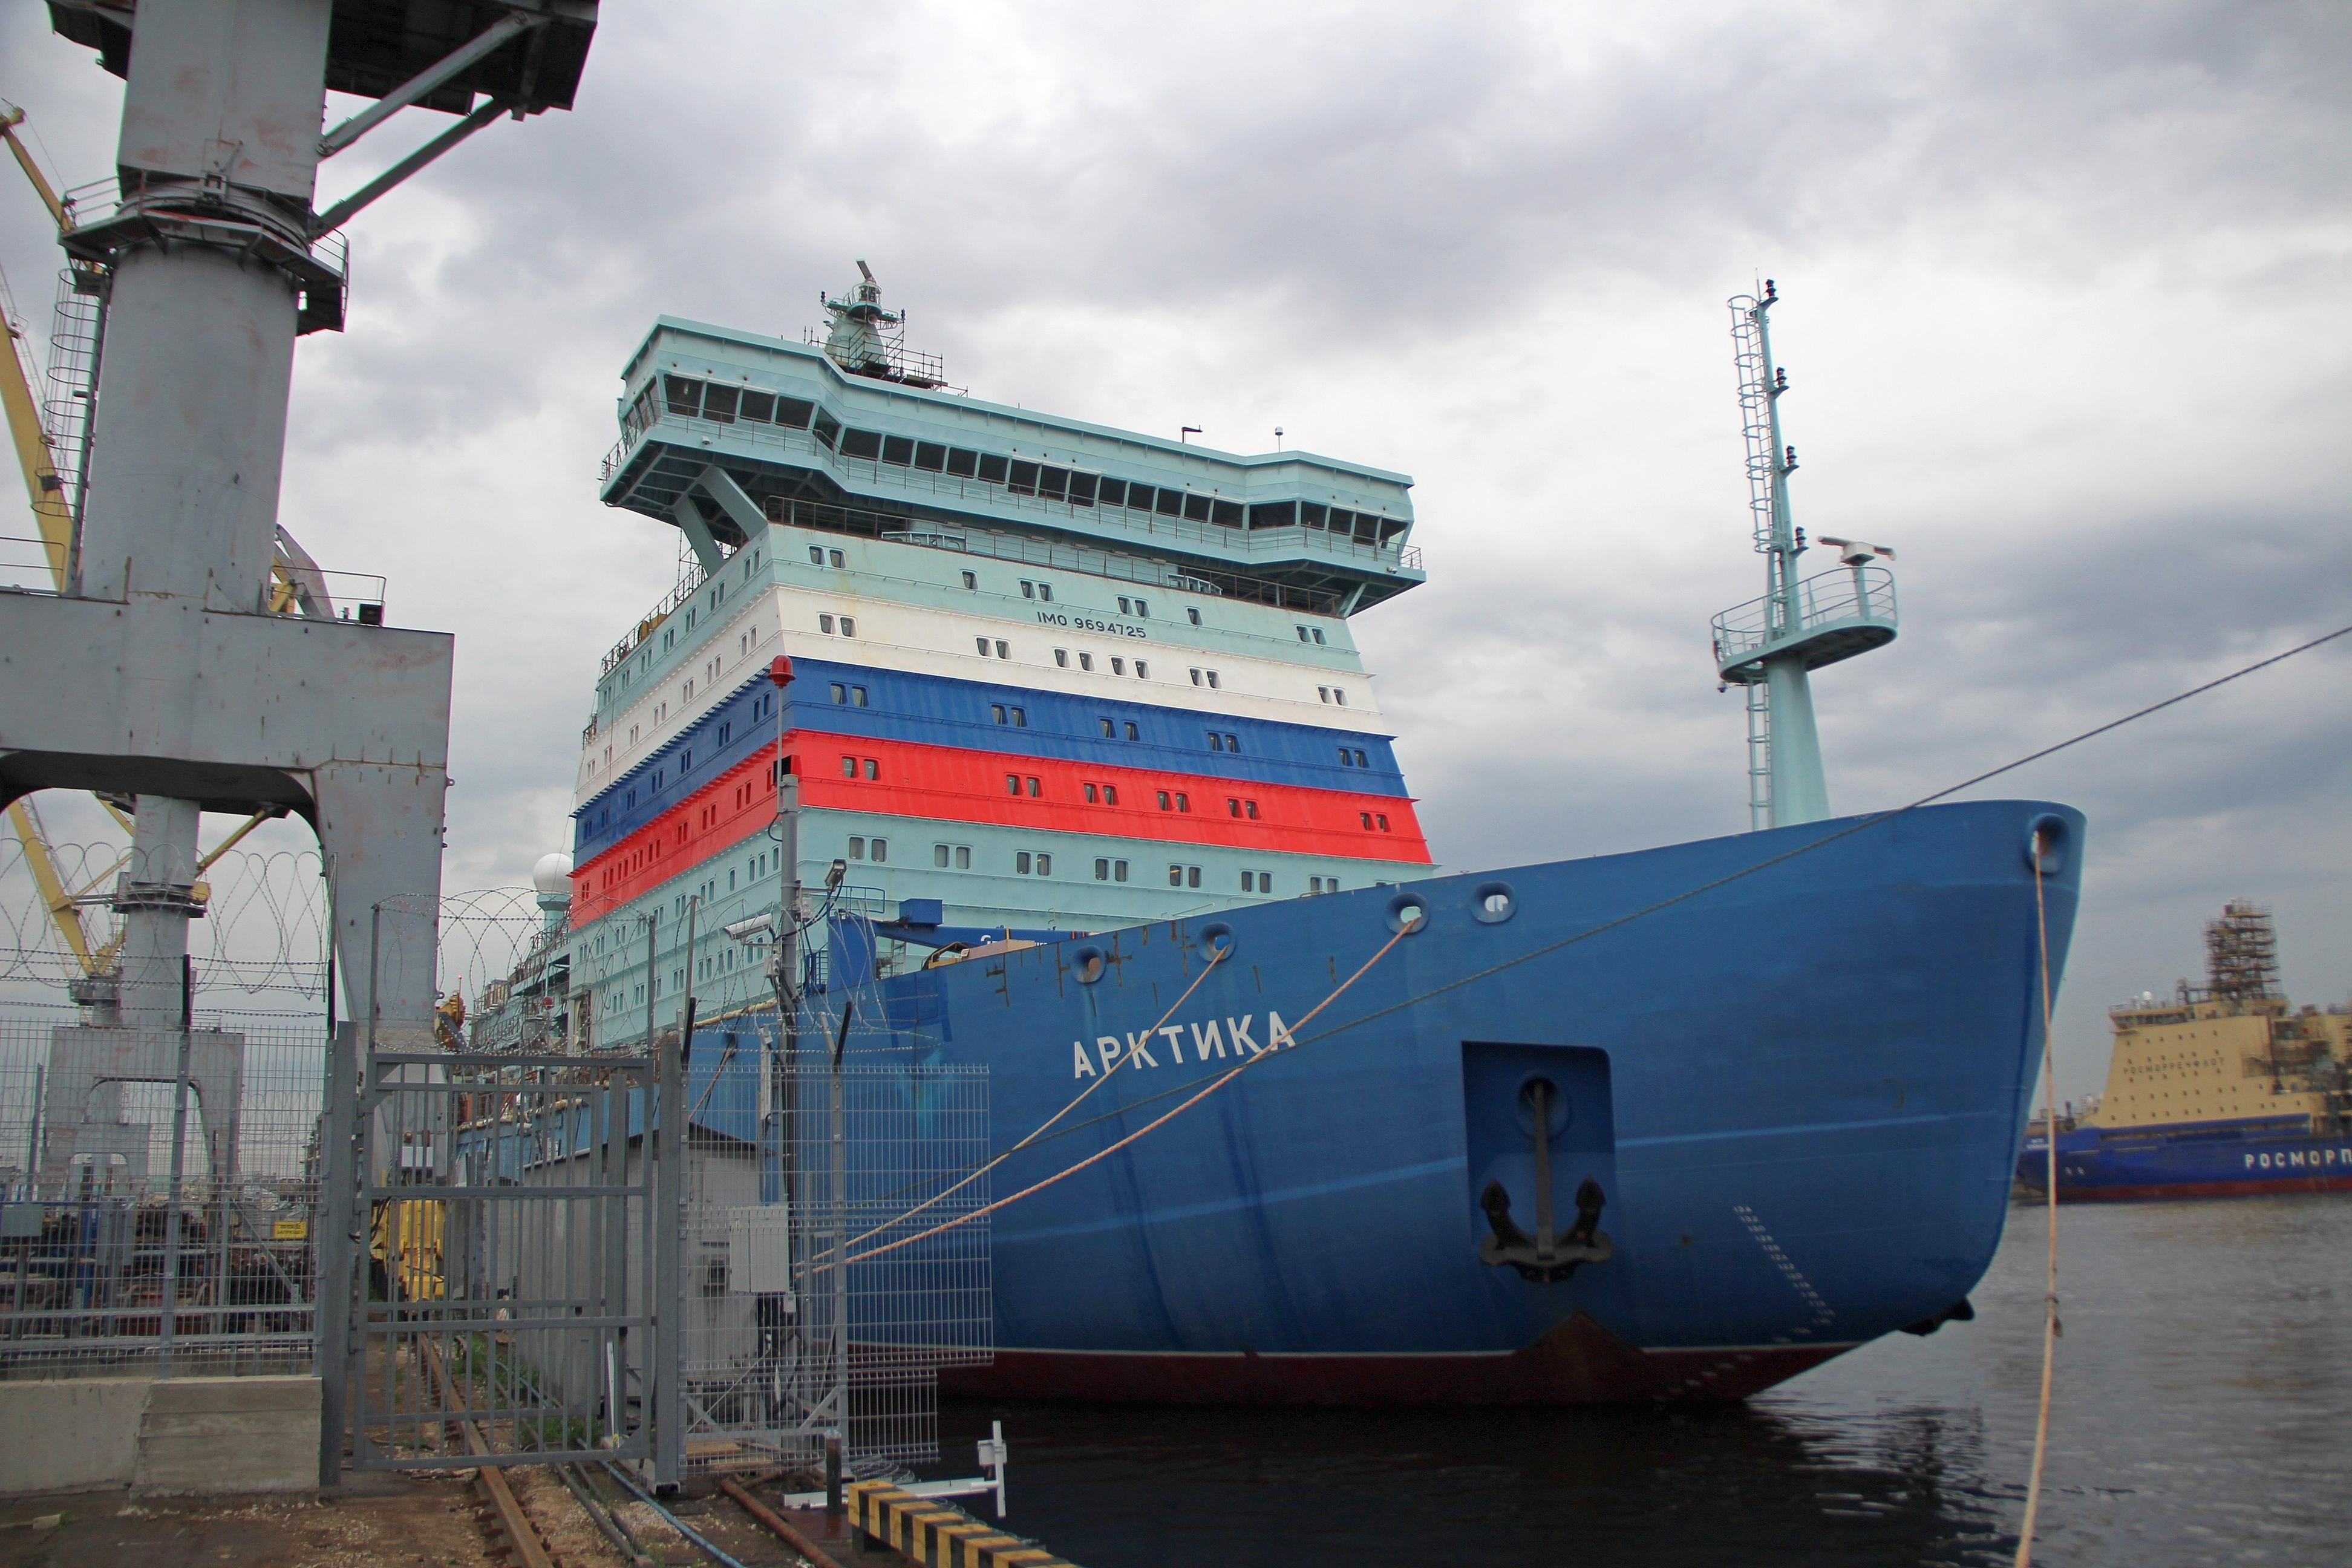 Icebreakers - Page 10 25-7533329-22220-ual-arktika-na-dostrojke-baltijskij-zavod-25.05.2019